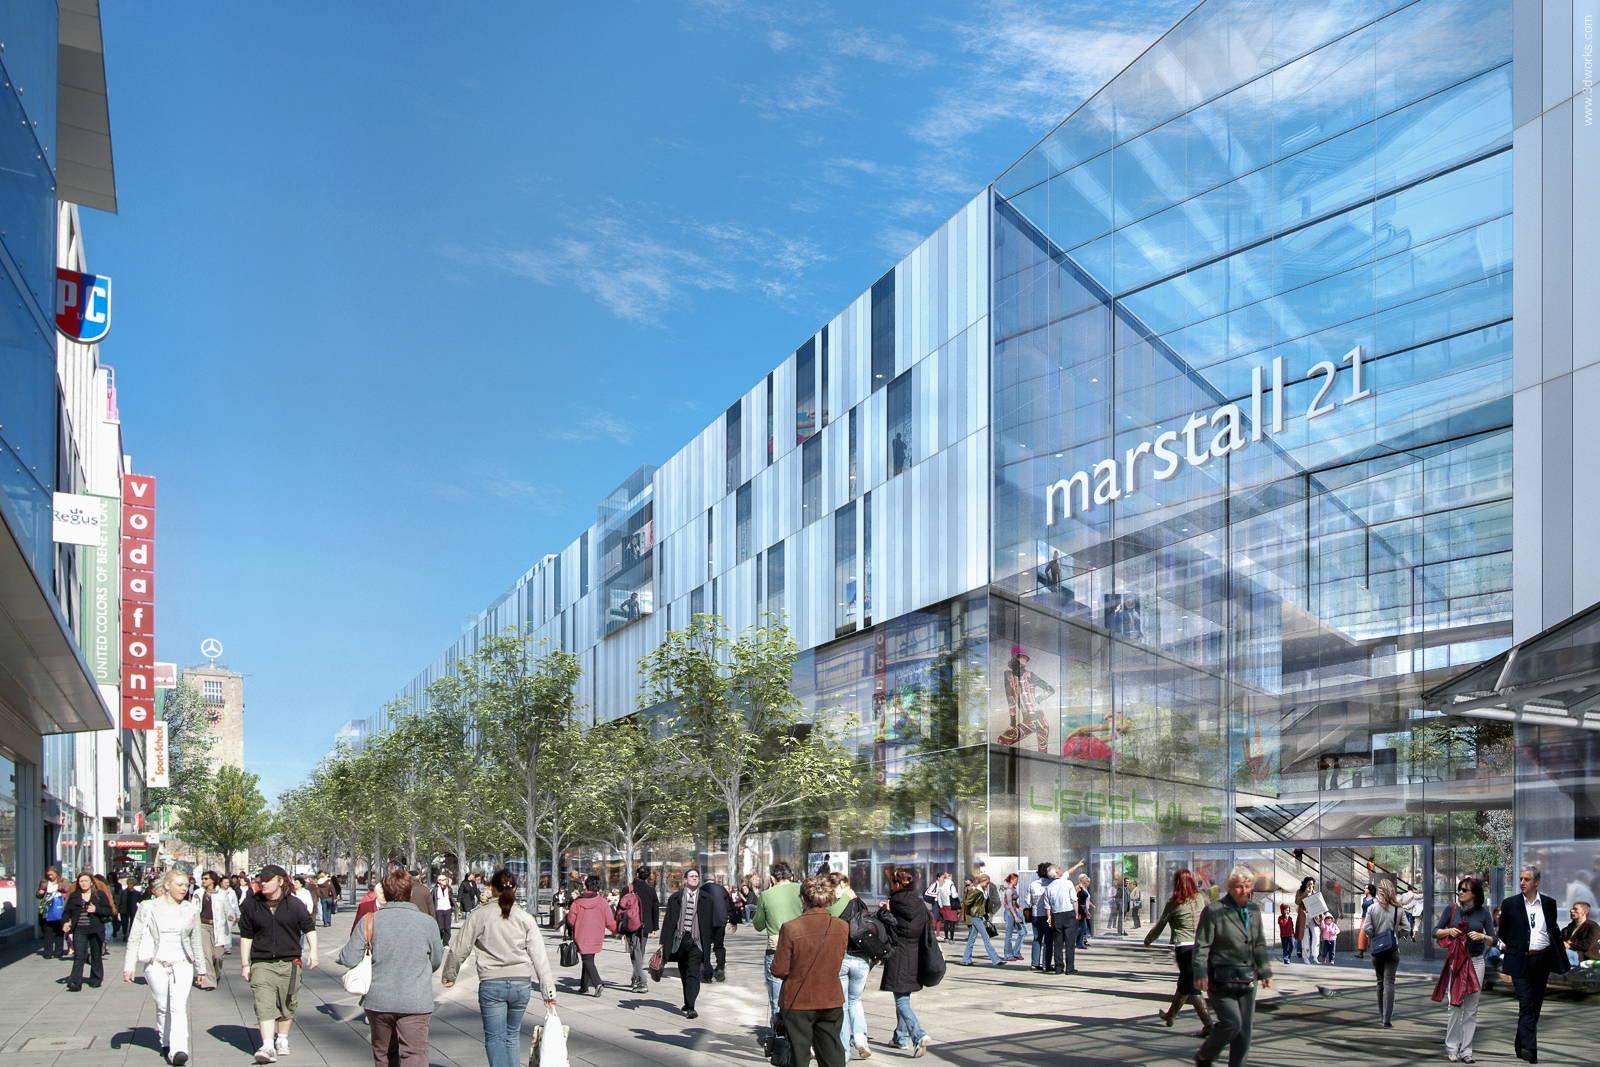 Architekturvisualisierung, Marstall 21, Stuttgart - Kunde: Michelgroup